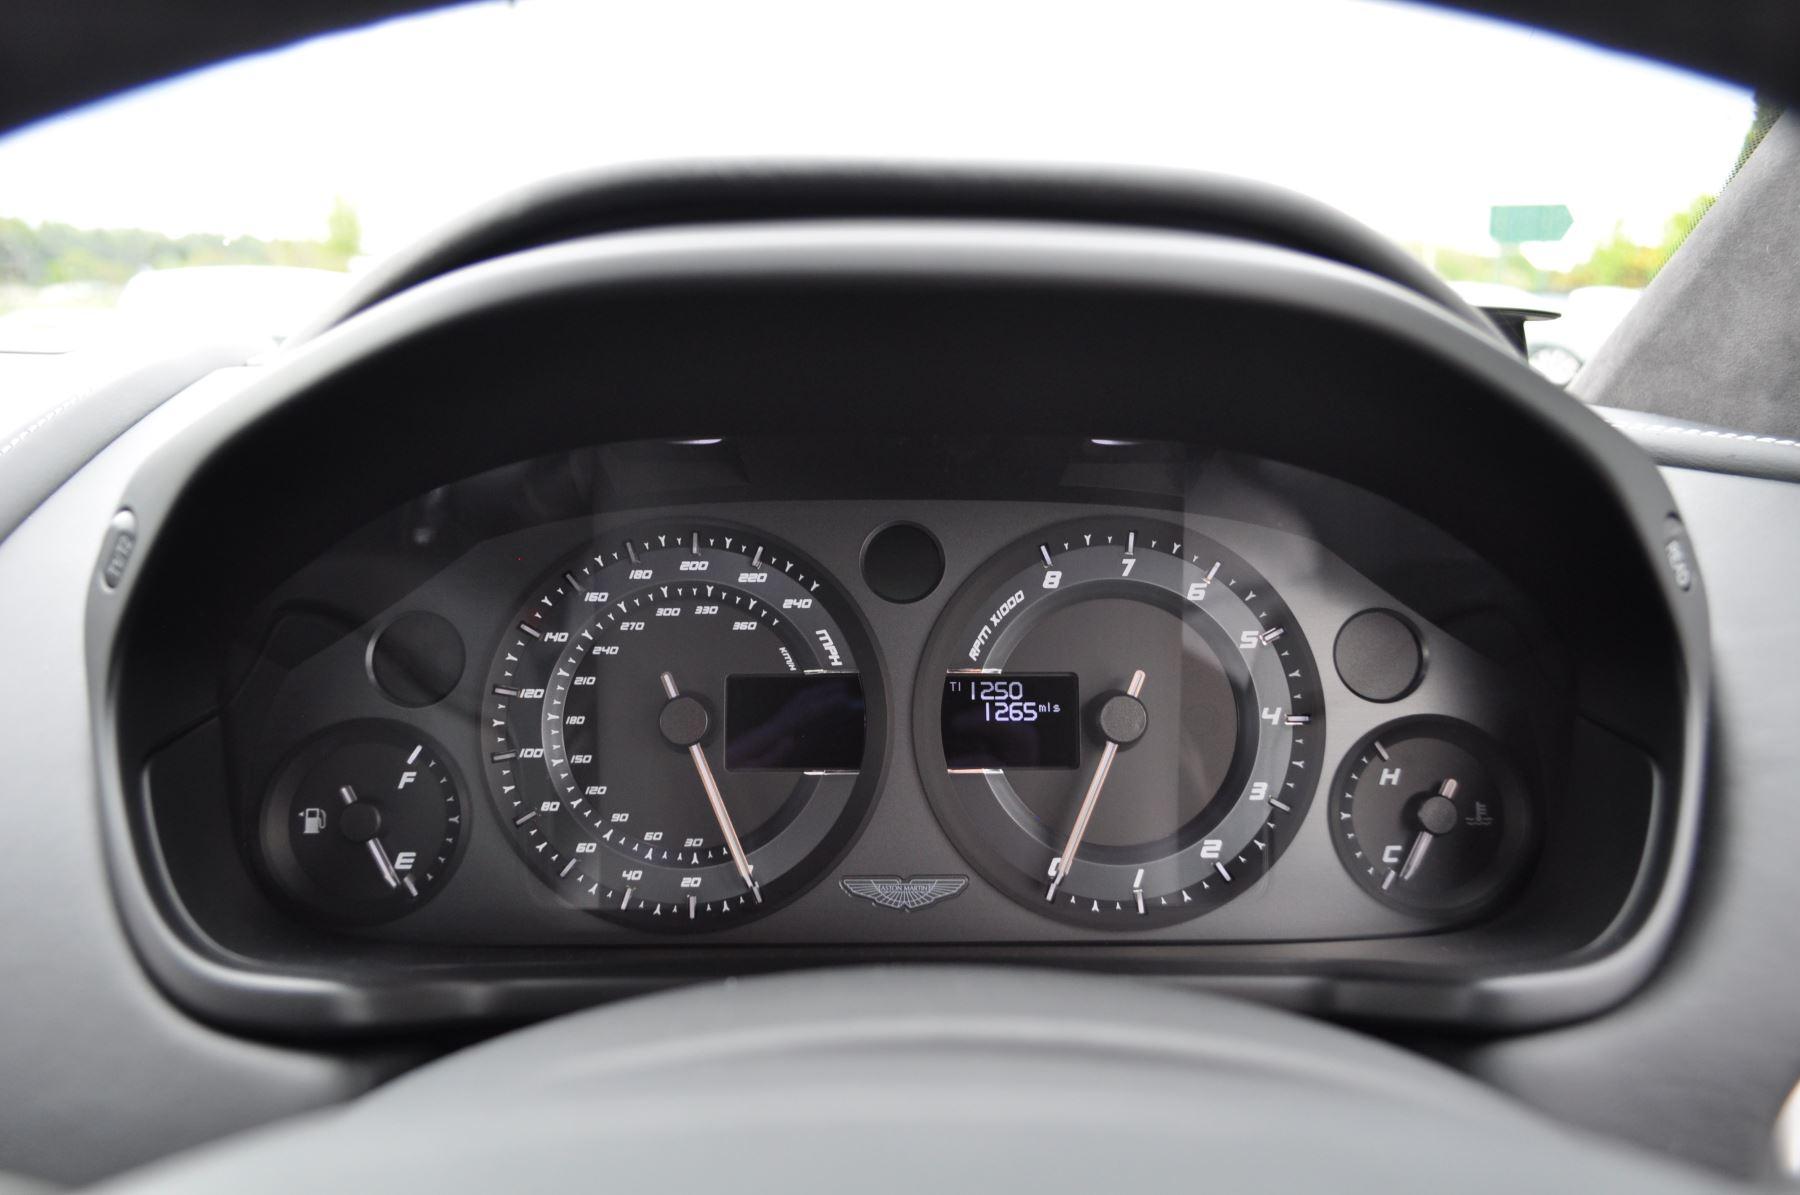 Aston Martin Vanquish S V12 [595] S 2+2 2dr Touchtronic image 30